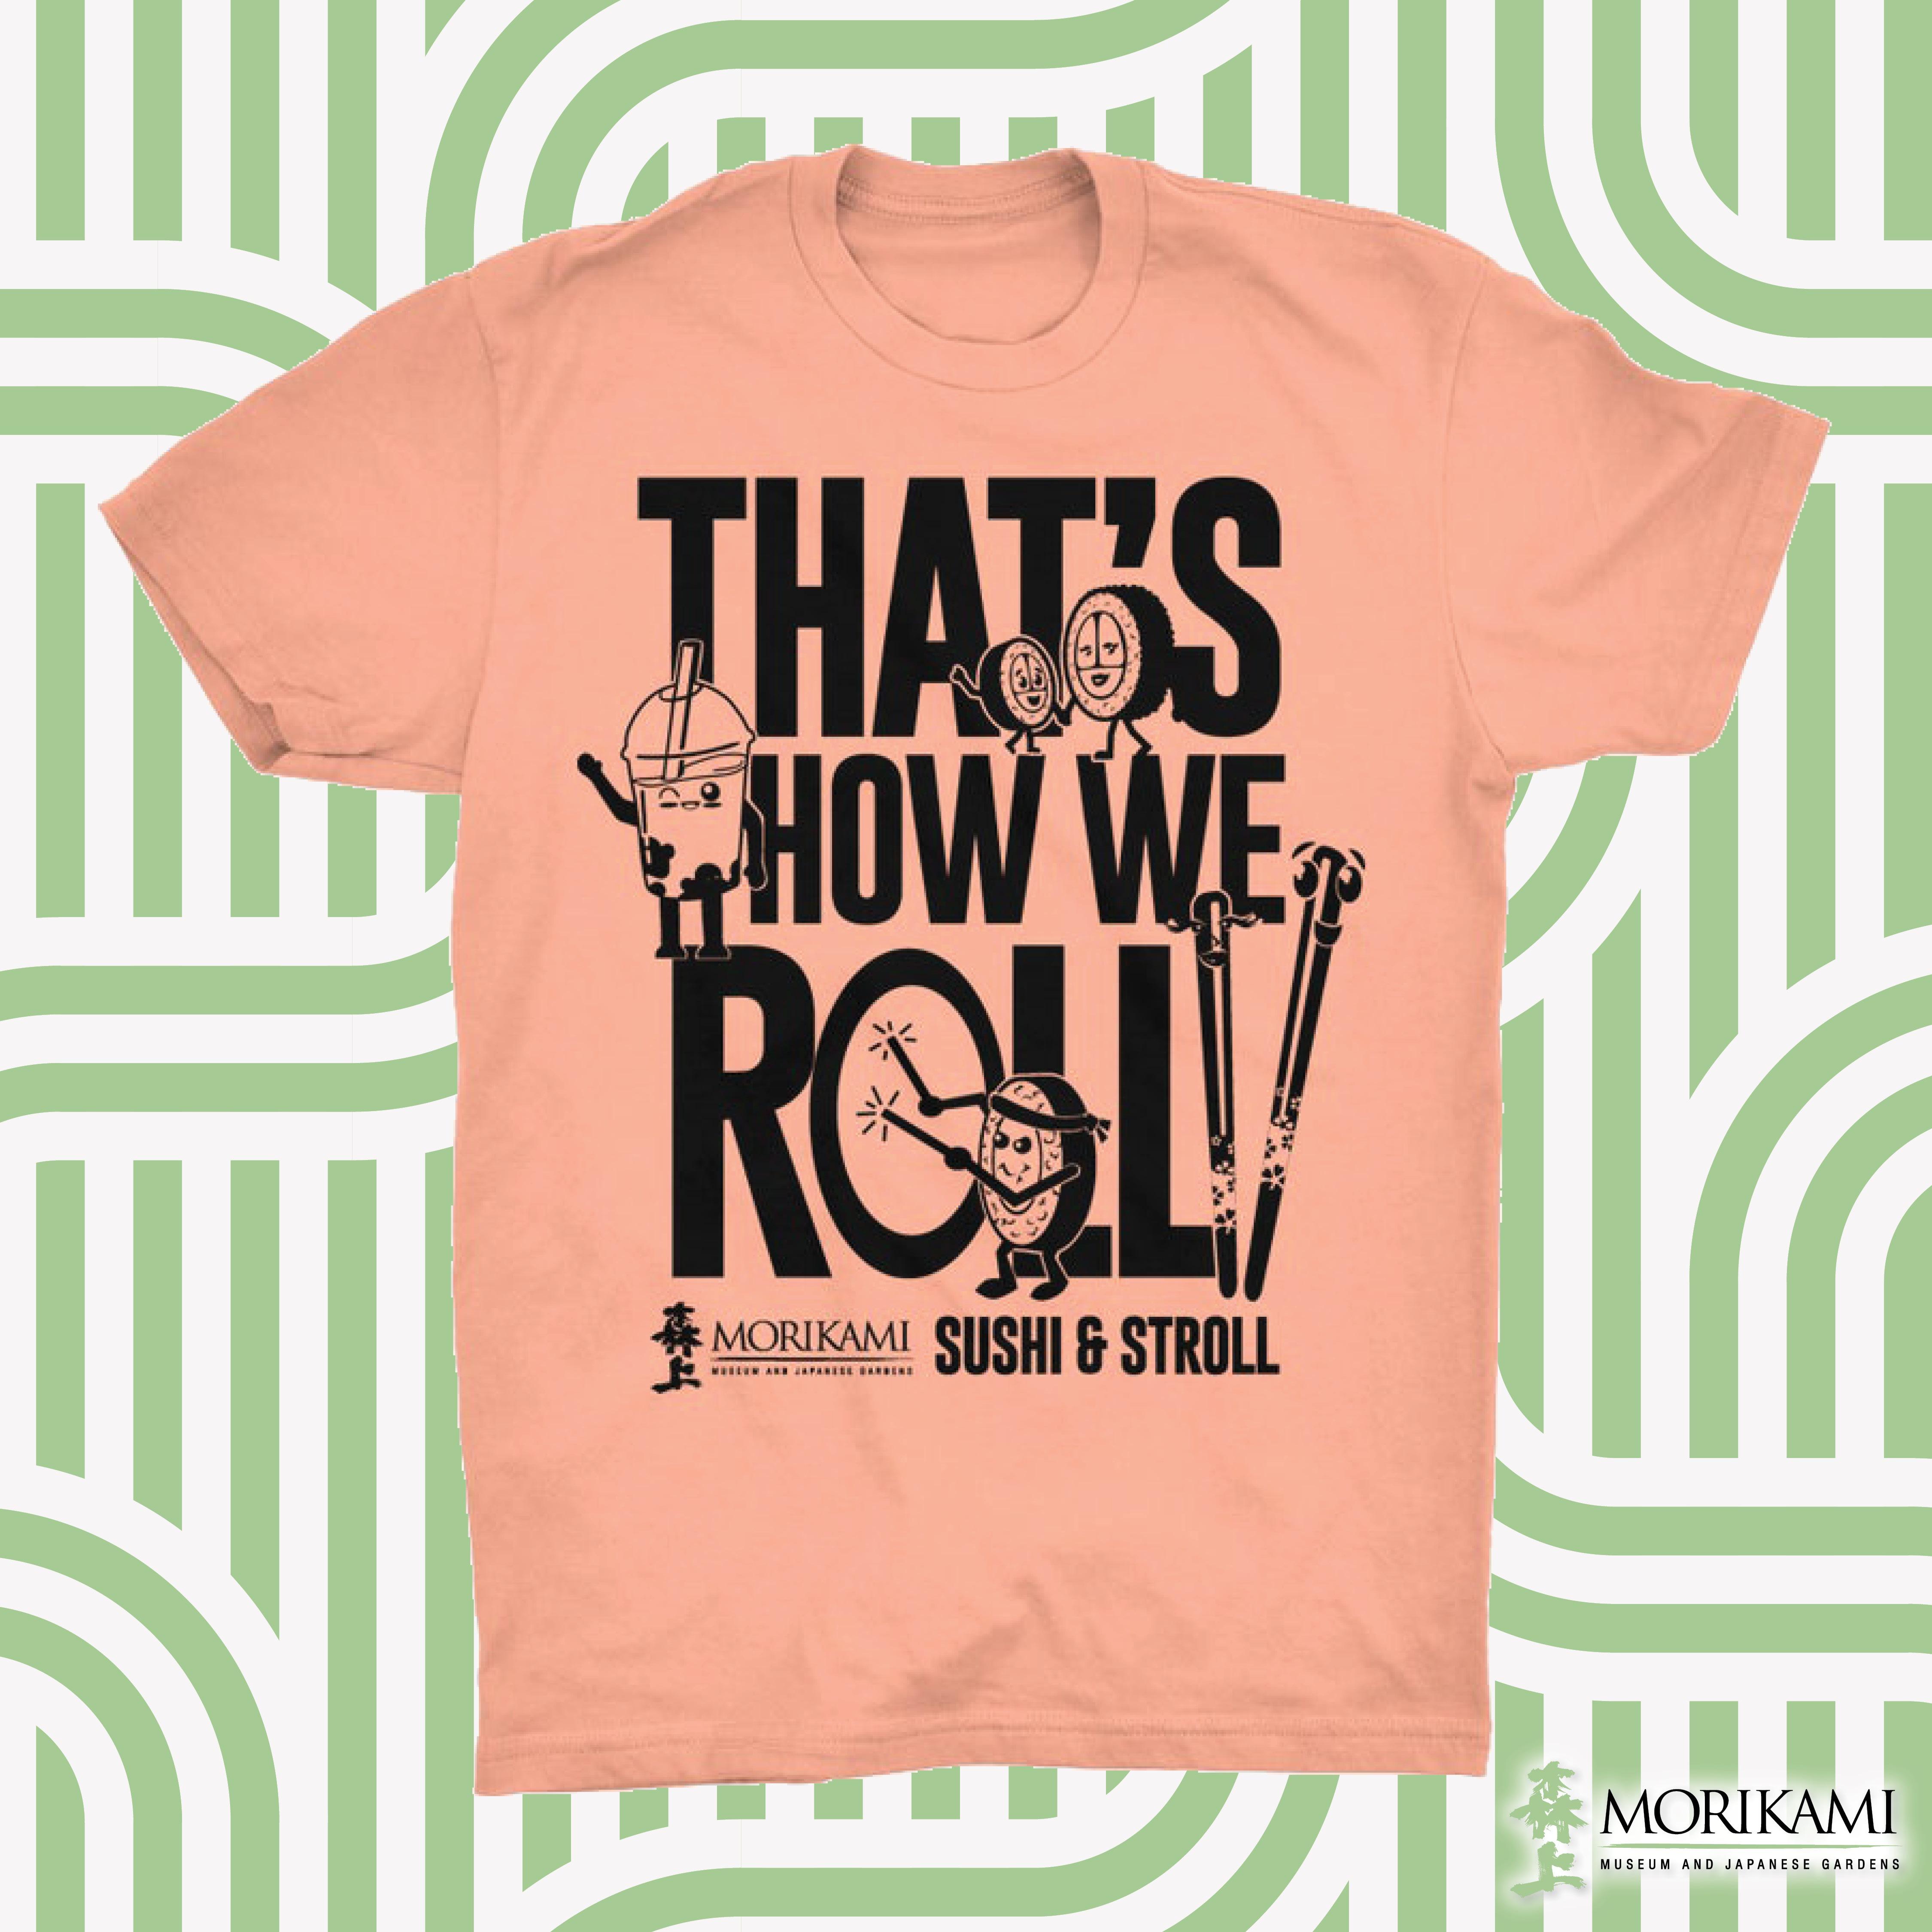 Sushi & Stroll t-shirts!